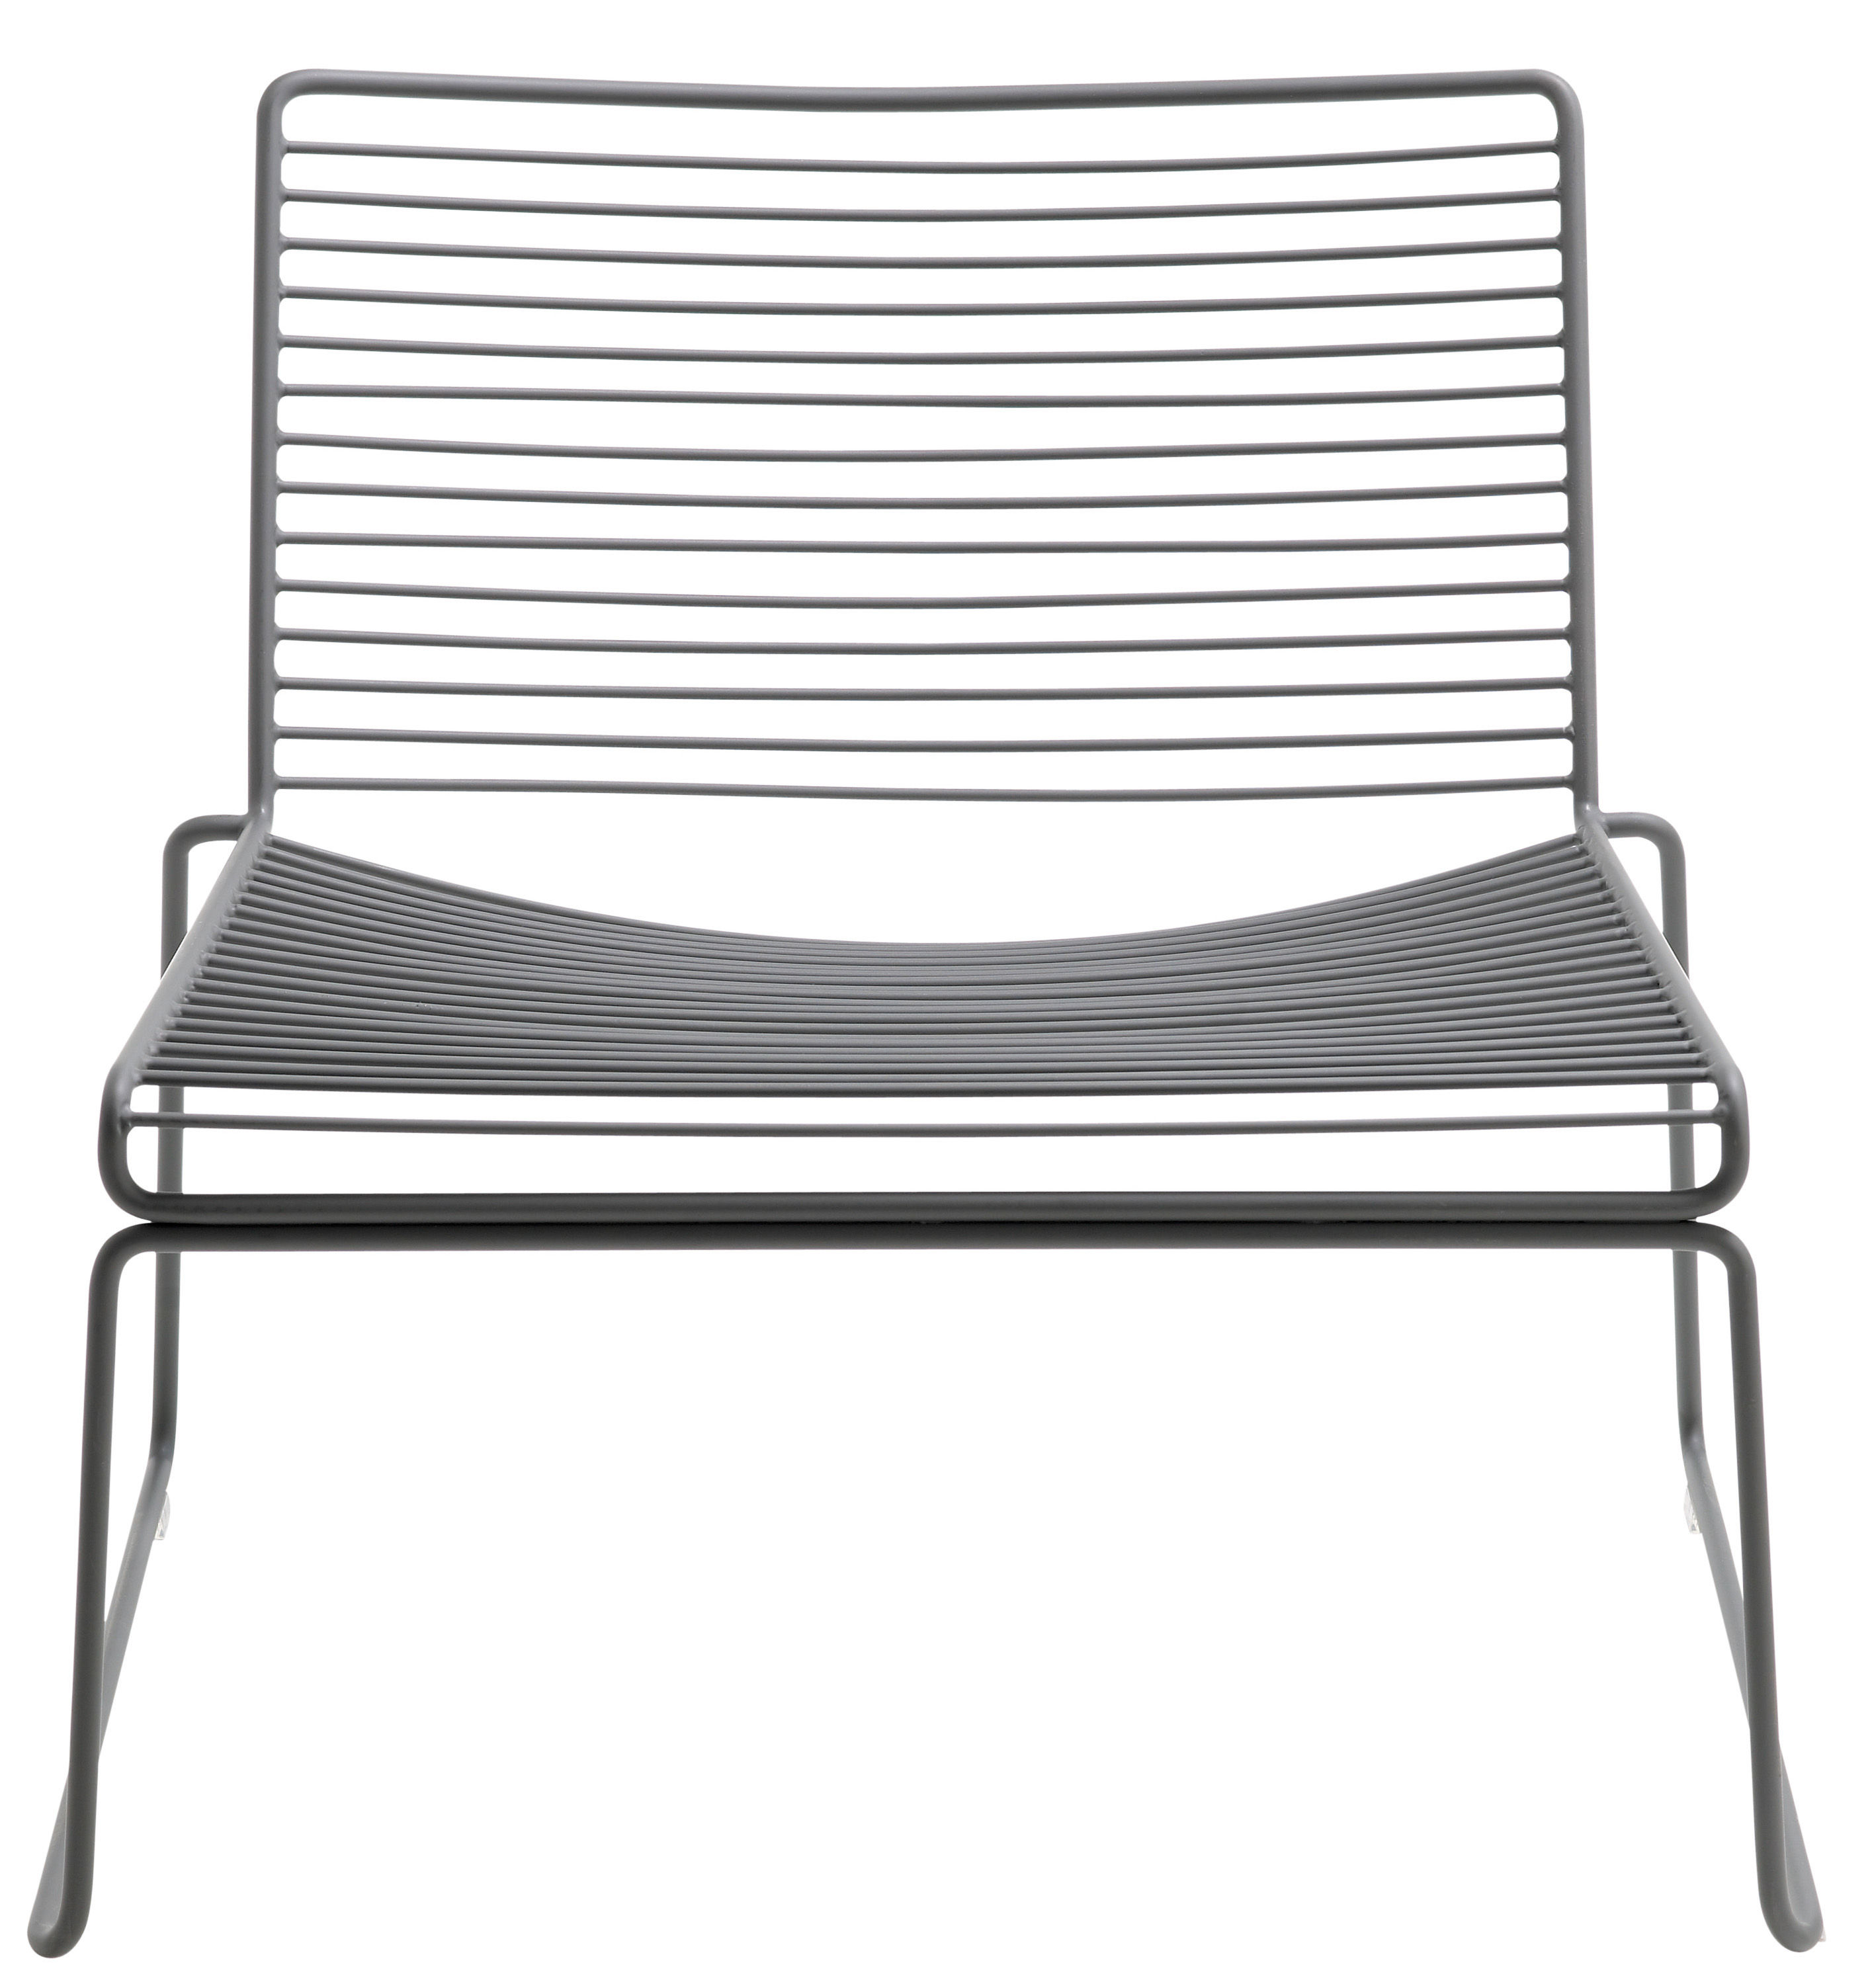 Möbel - Lounge Sessel - Hee Lounge Sessel Clubsessel - Hay - Grau - lackierter Stahl